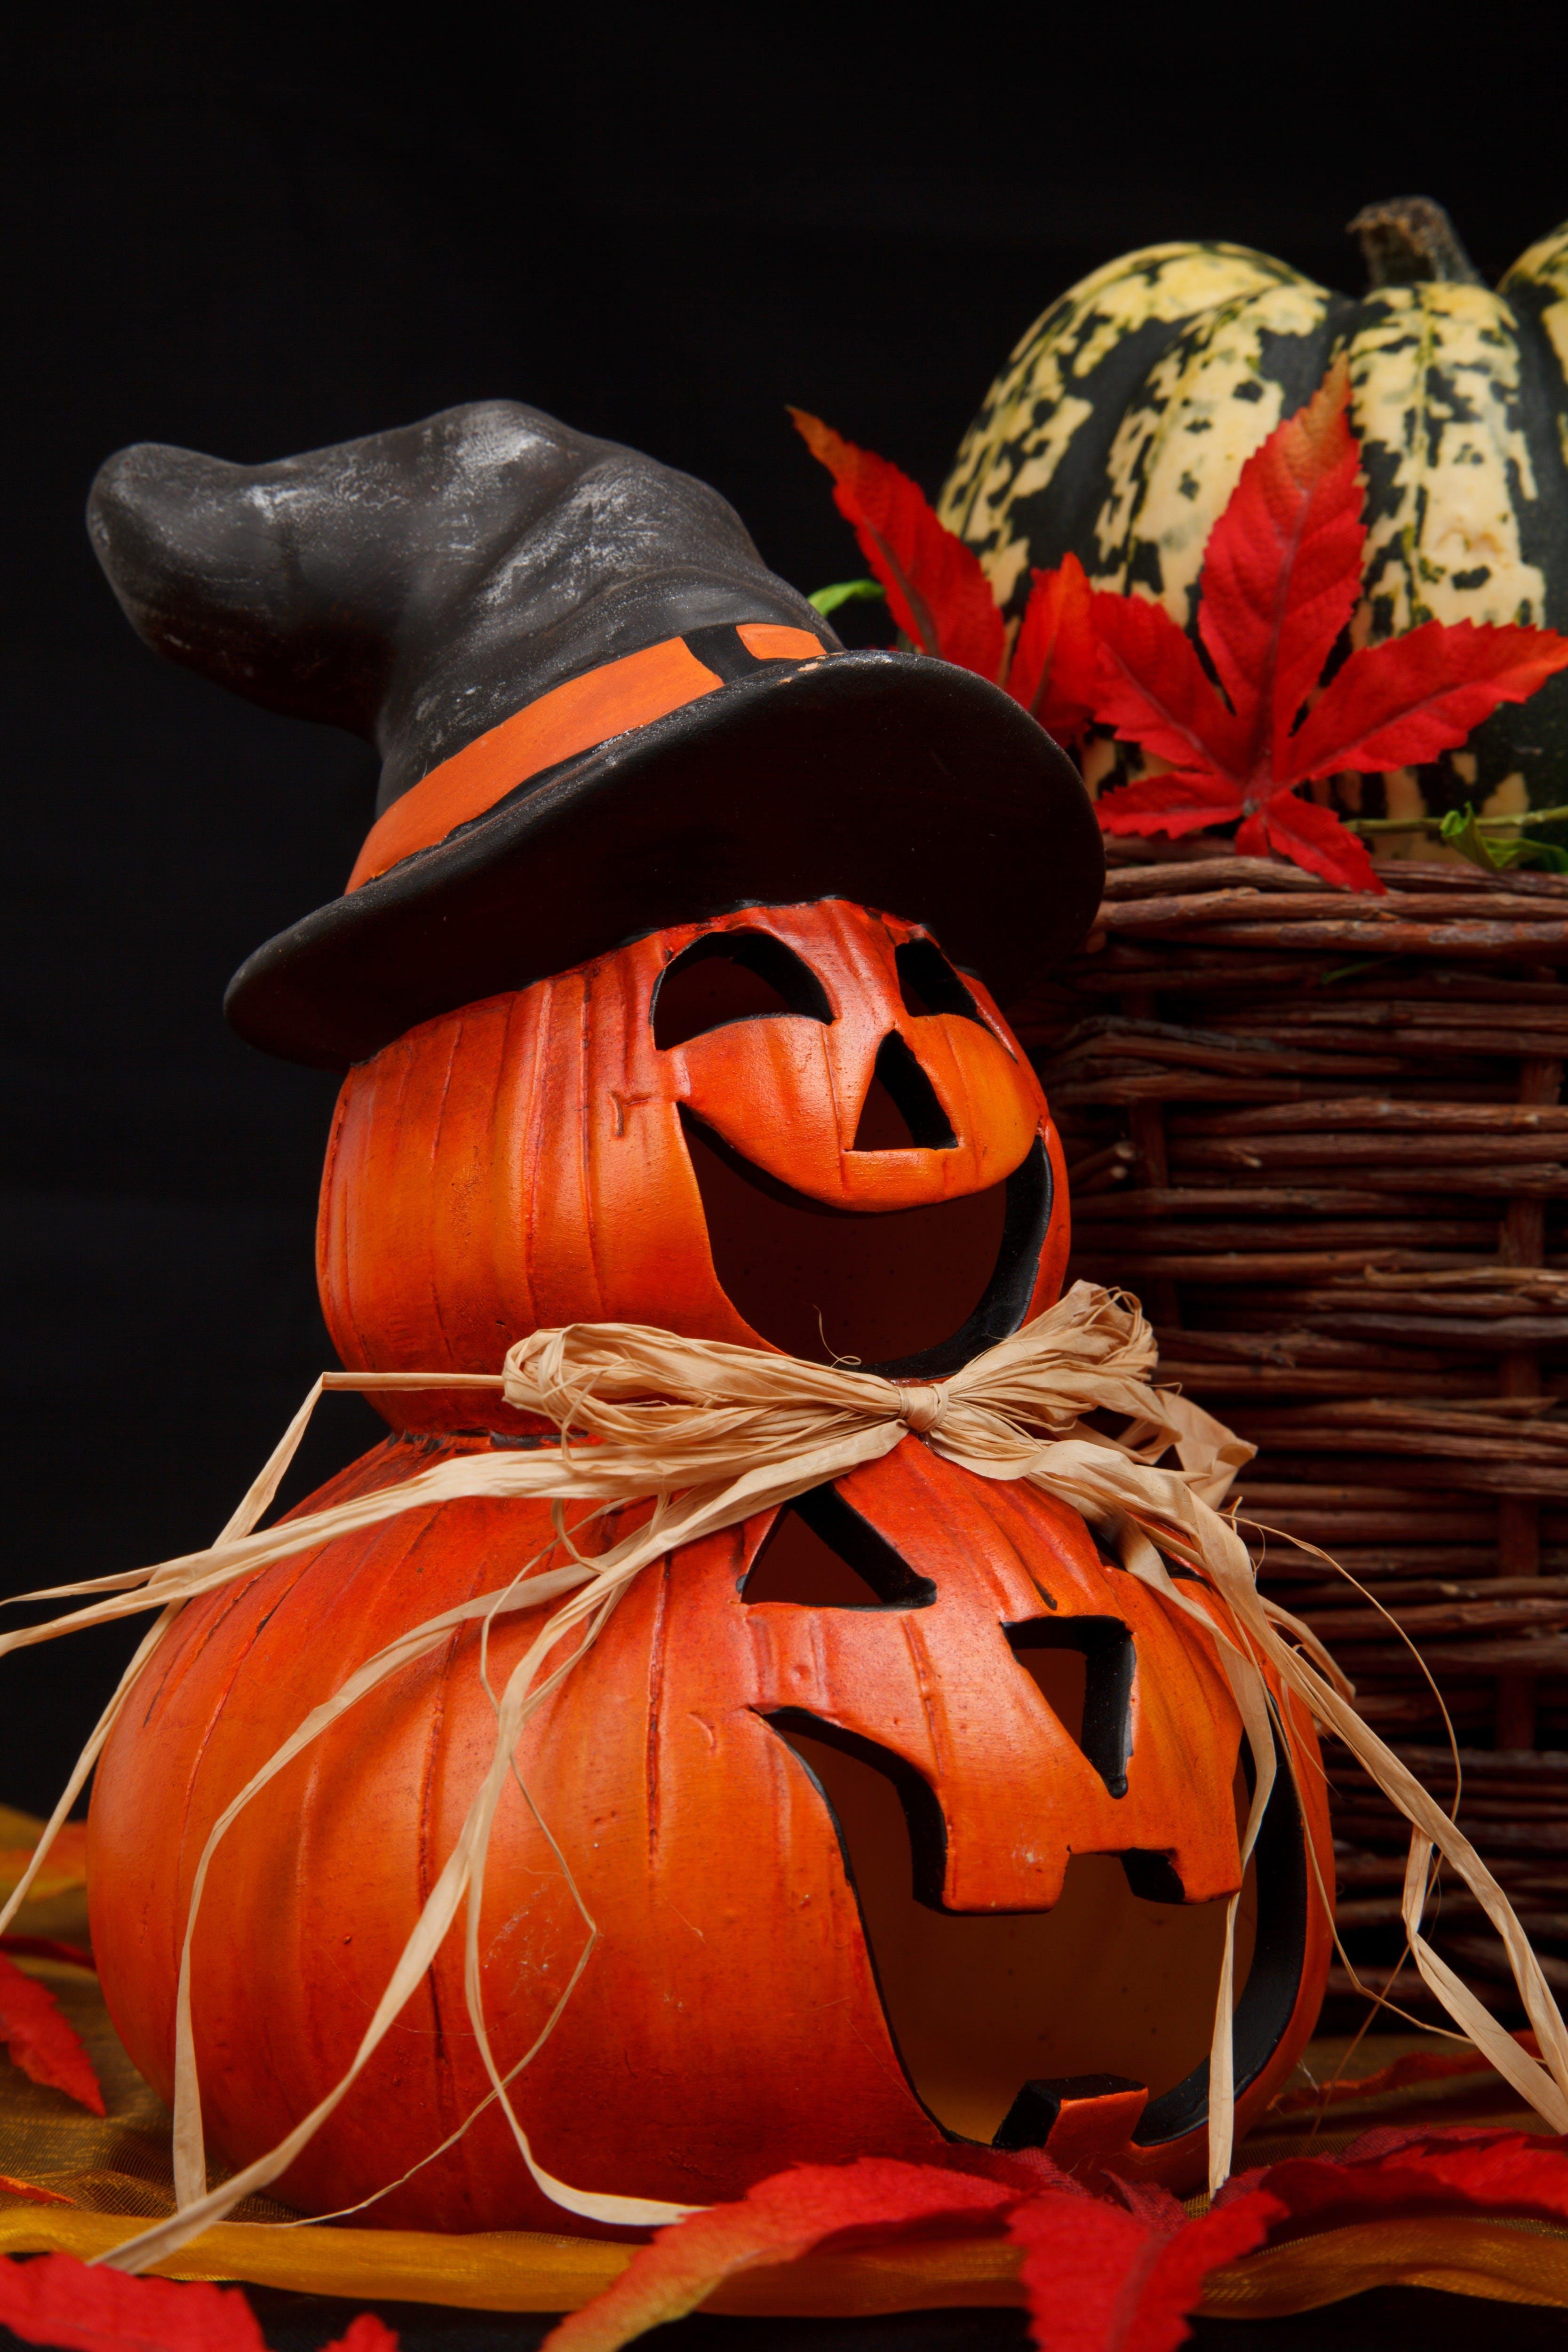 Red Jack-o'-lantern Witch Decor